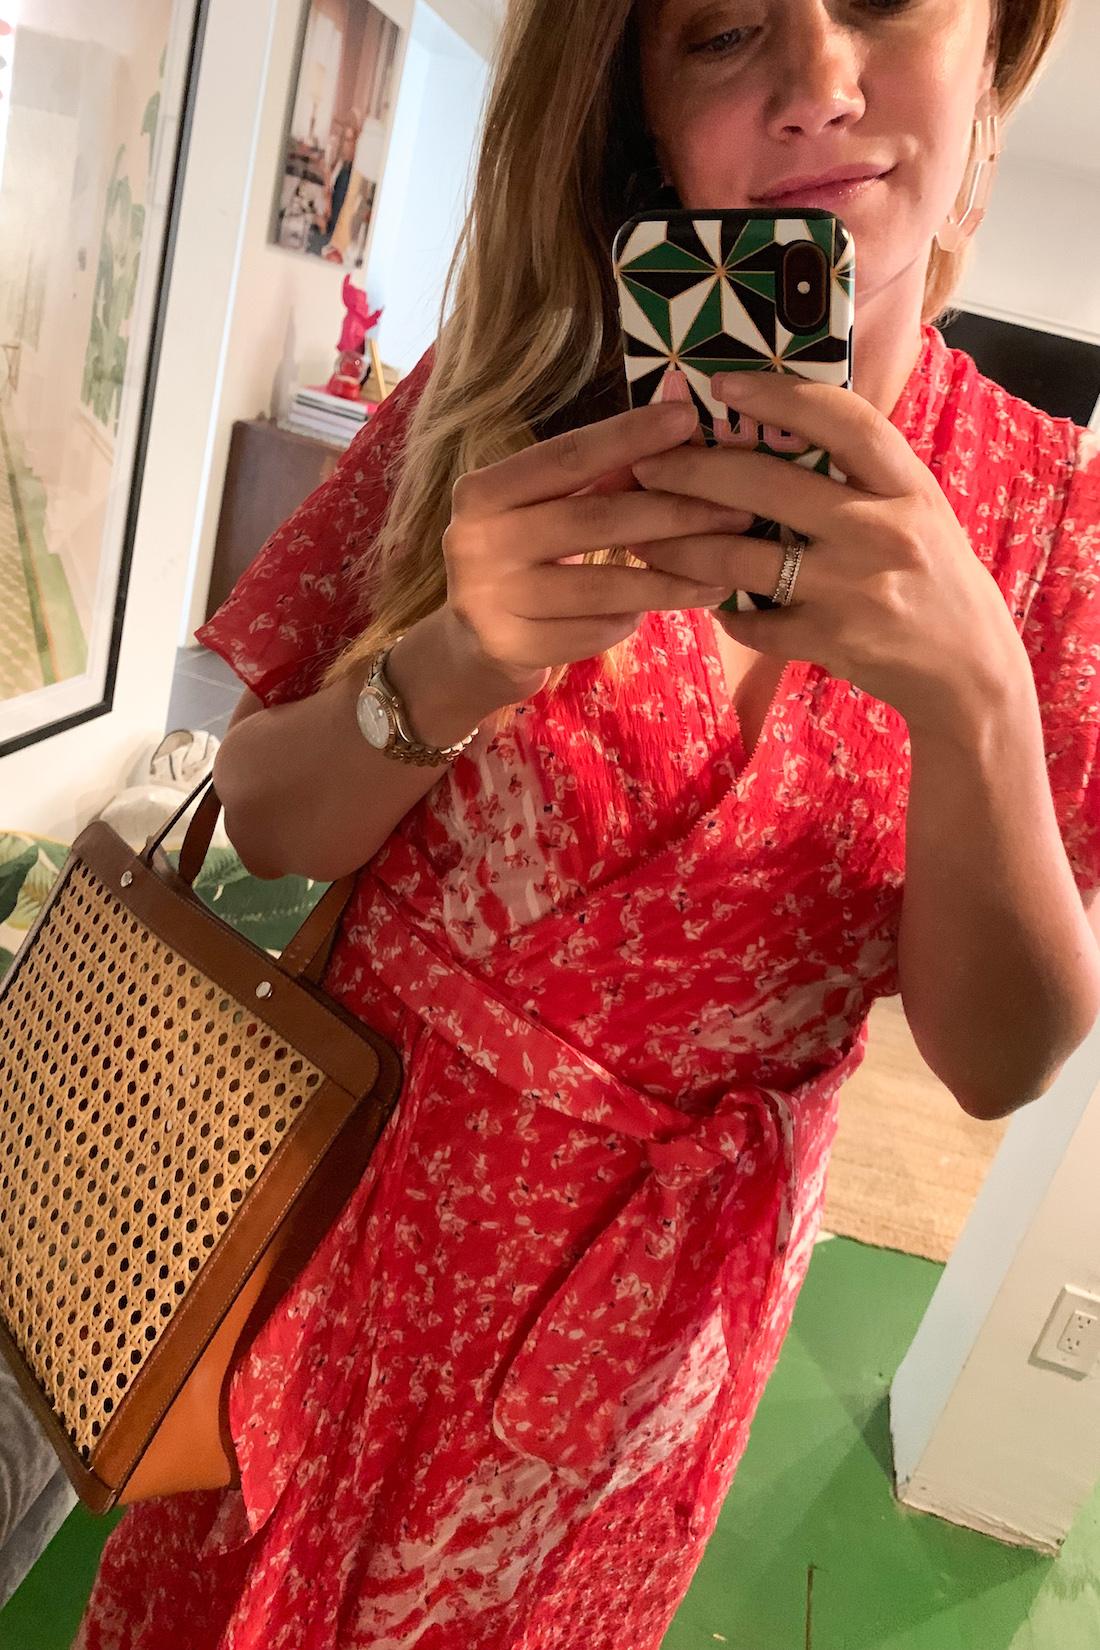 grace in a red dress